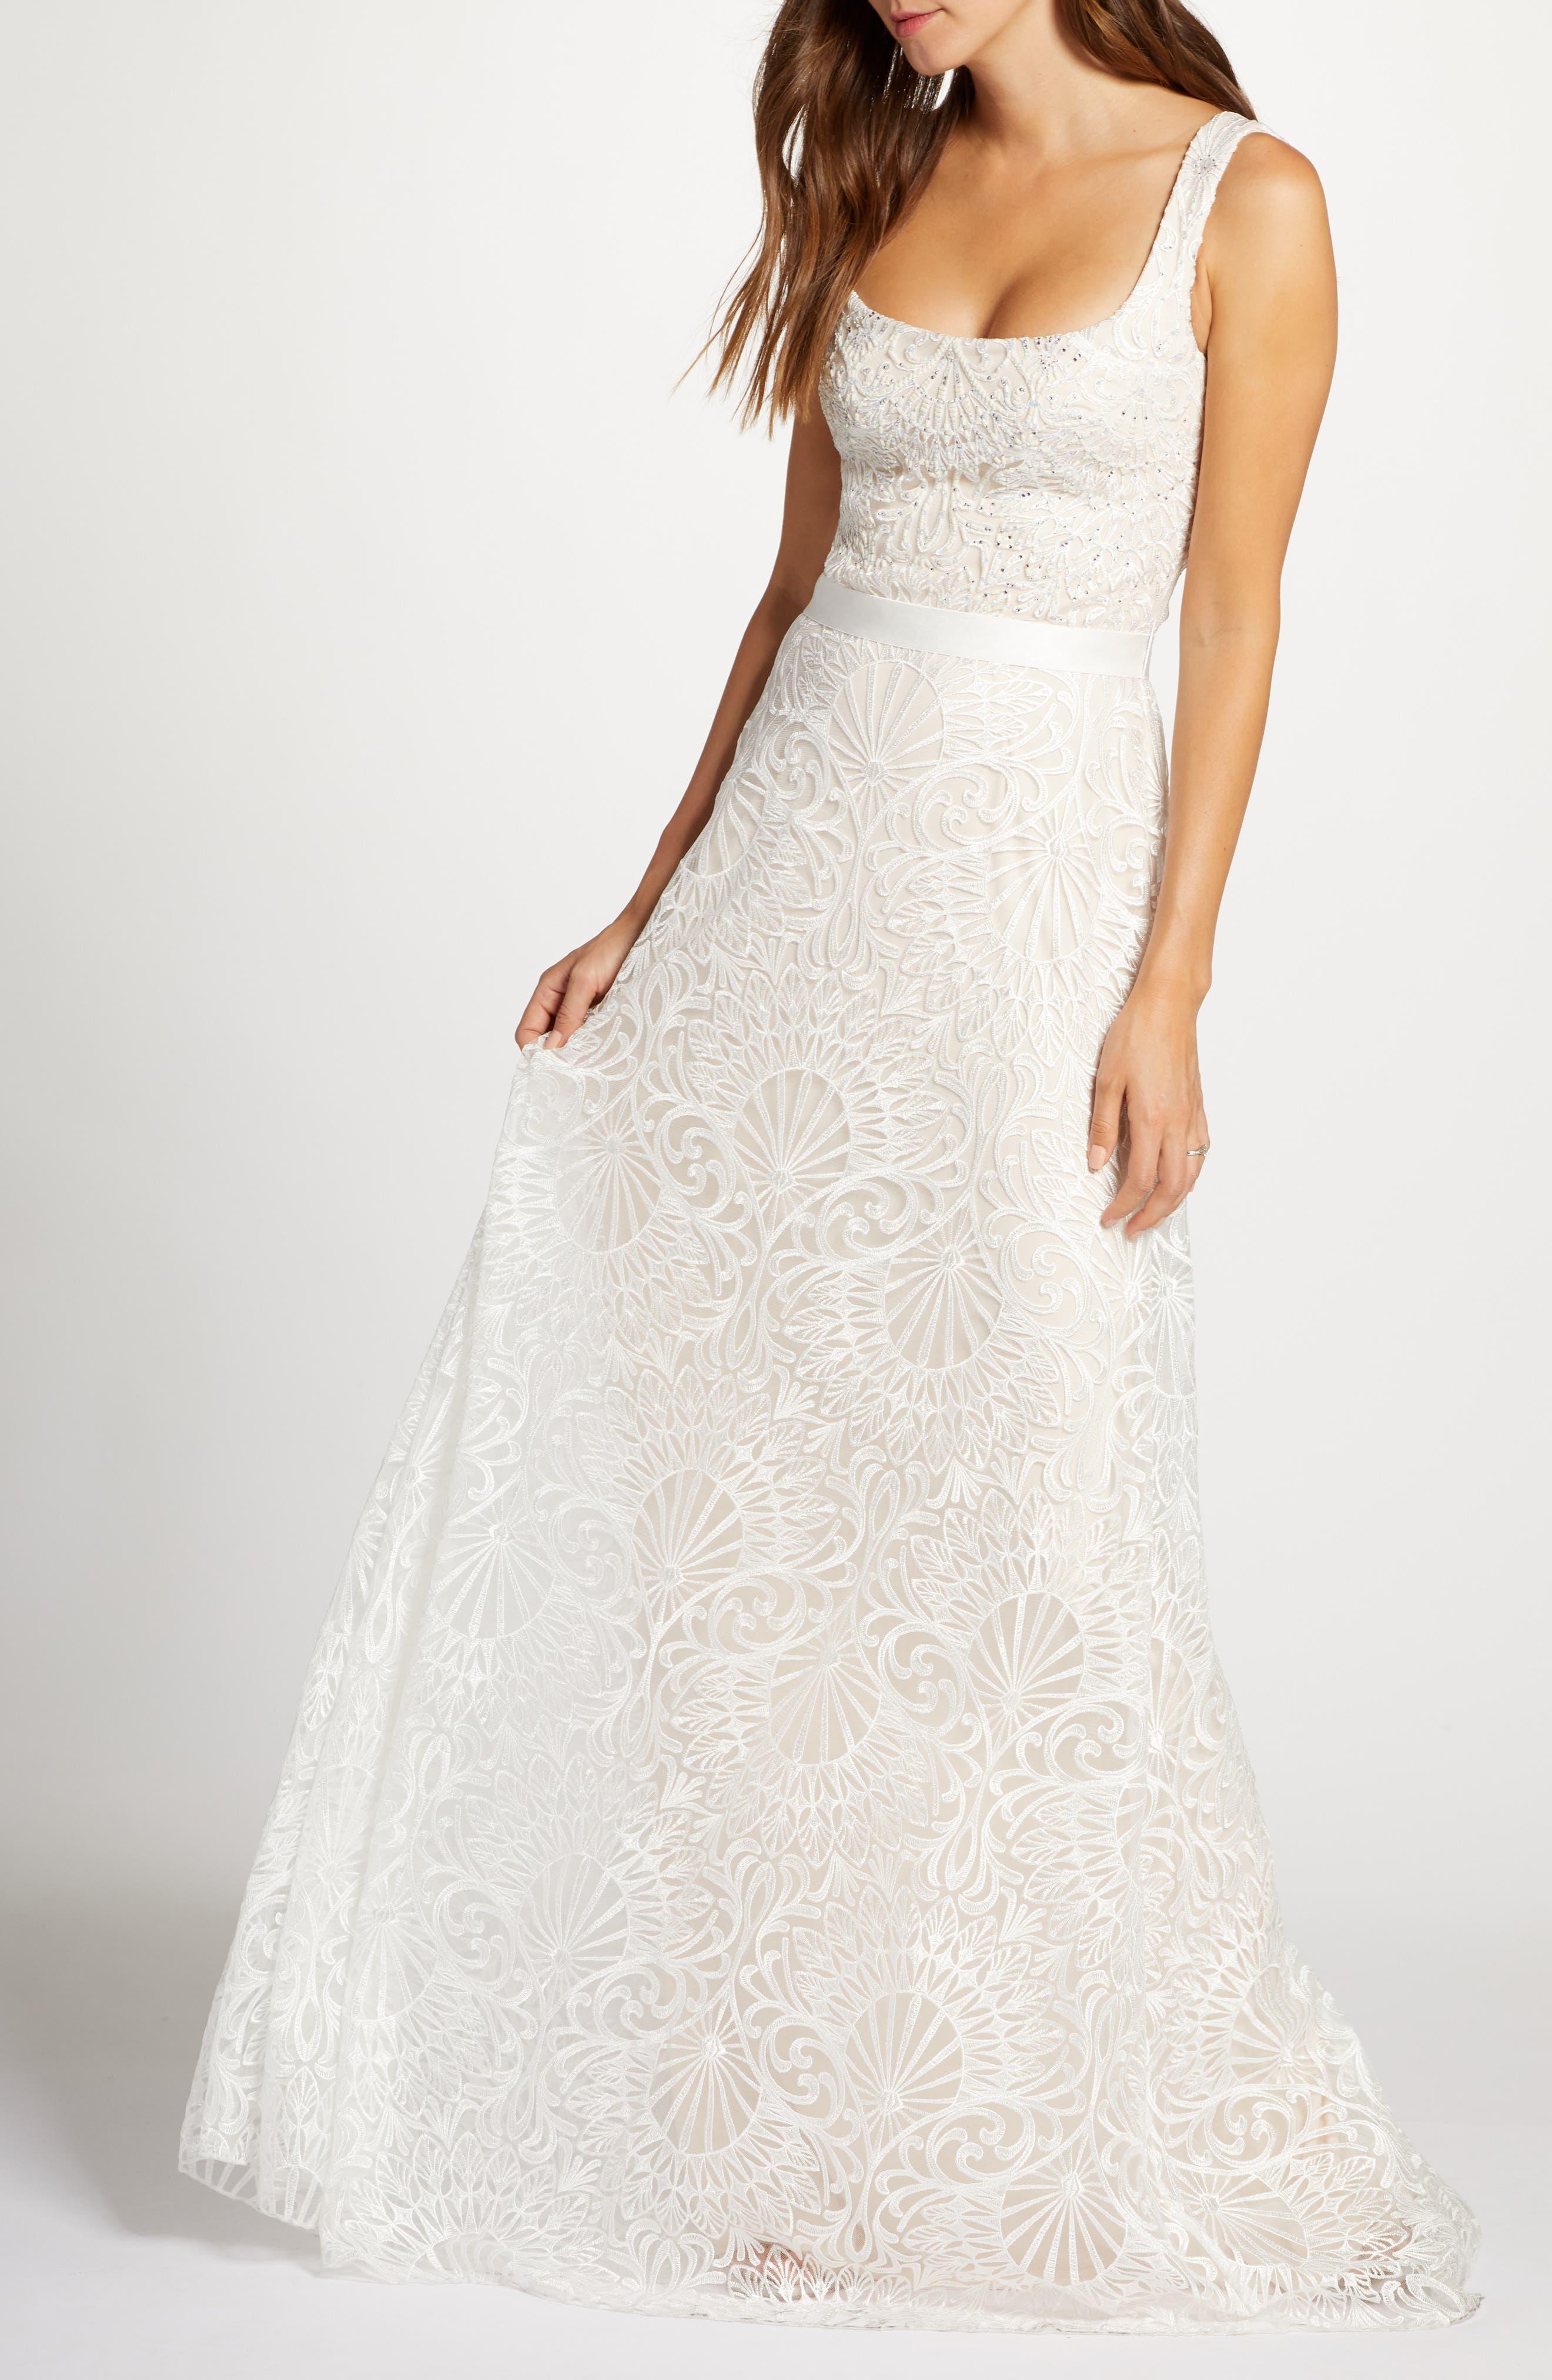 Tadashi Shoji Beaded Lace Wedding Gown   Nordstrom